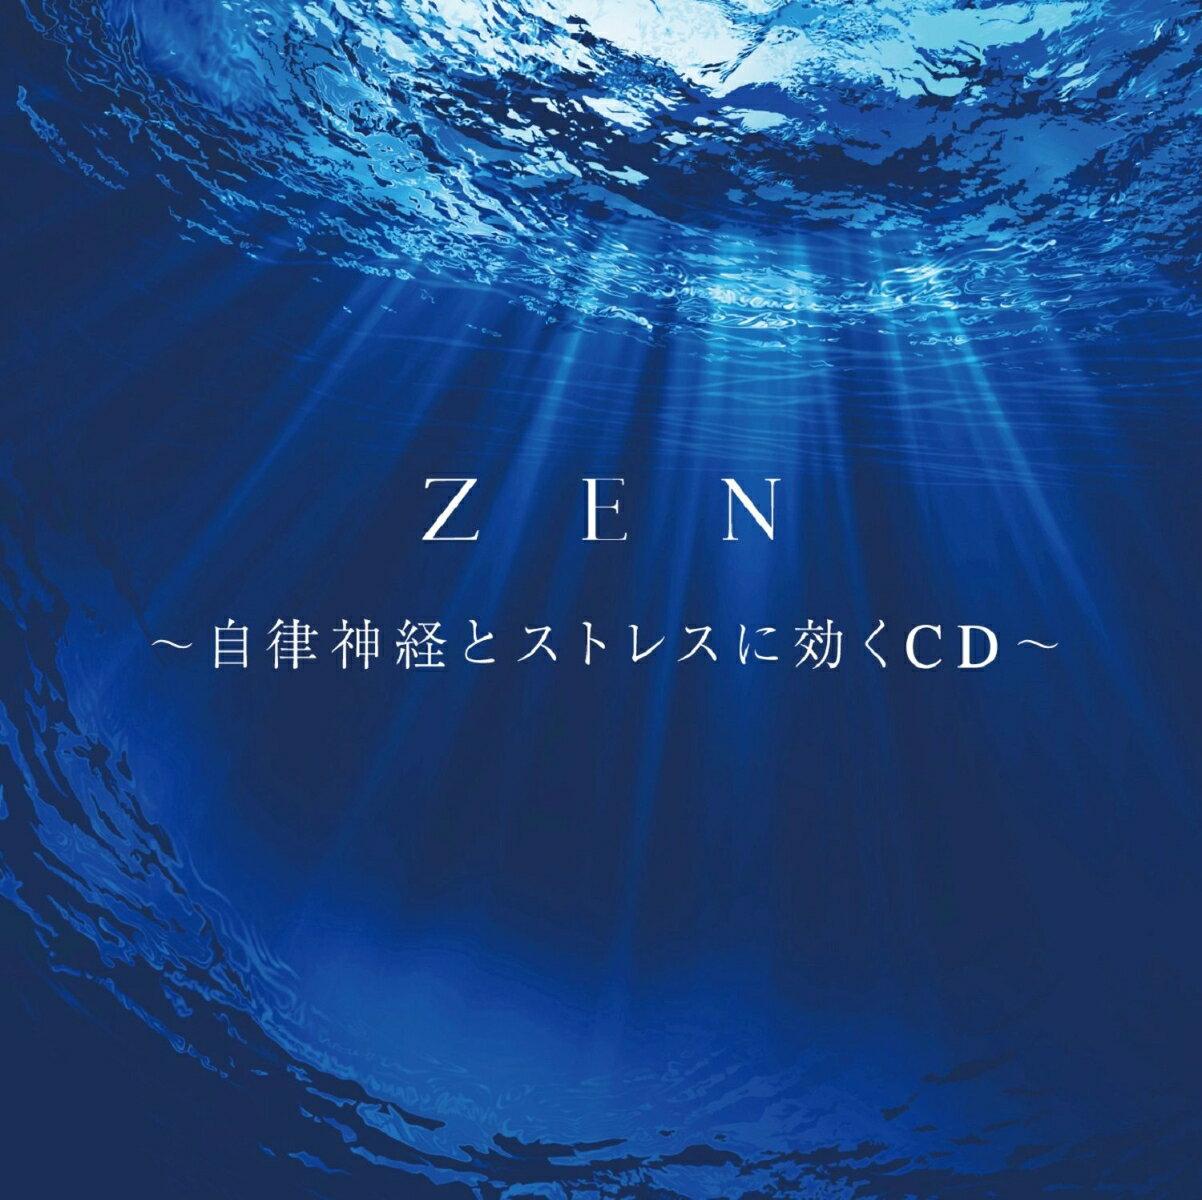 ZEN〜自律神経とストレスに効くCD〜 [ (V.A.) ]